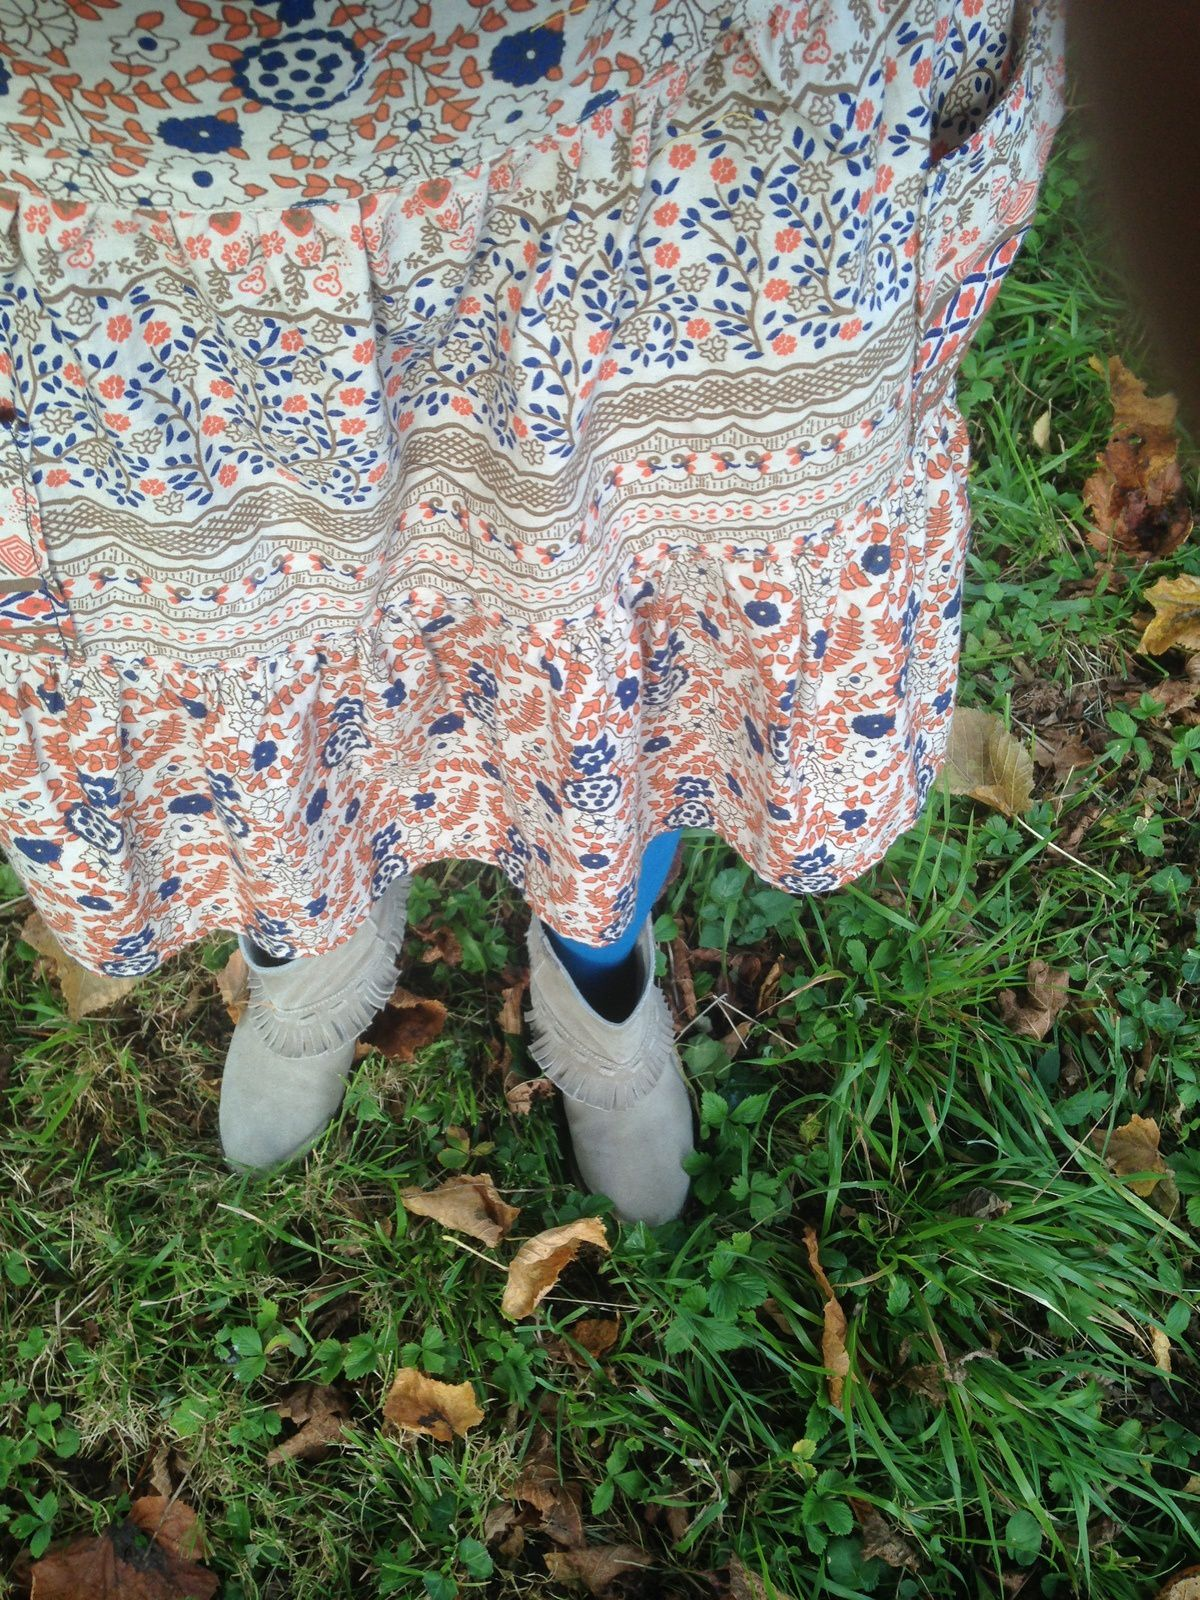 transformation 2 jupes en une jupe sur charlotteblablablog